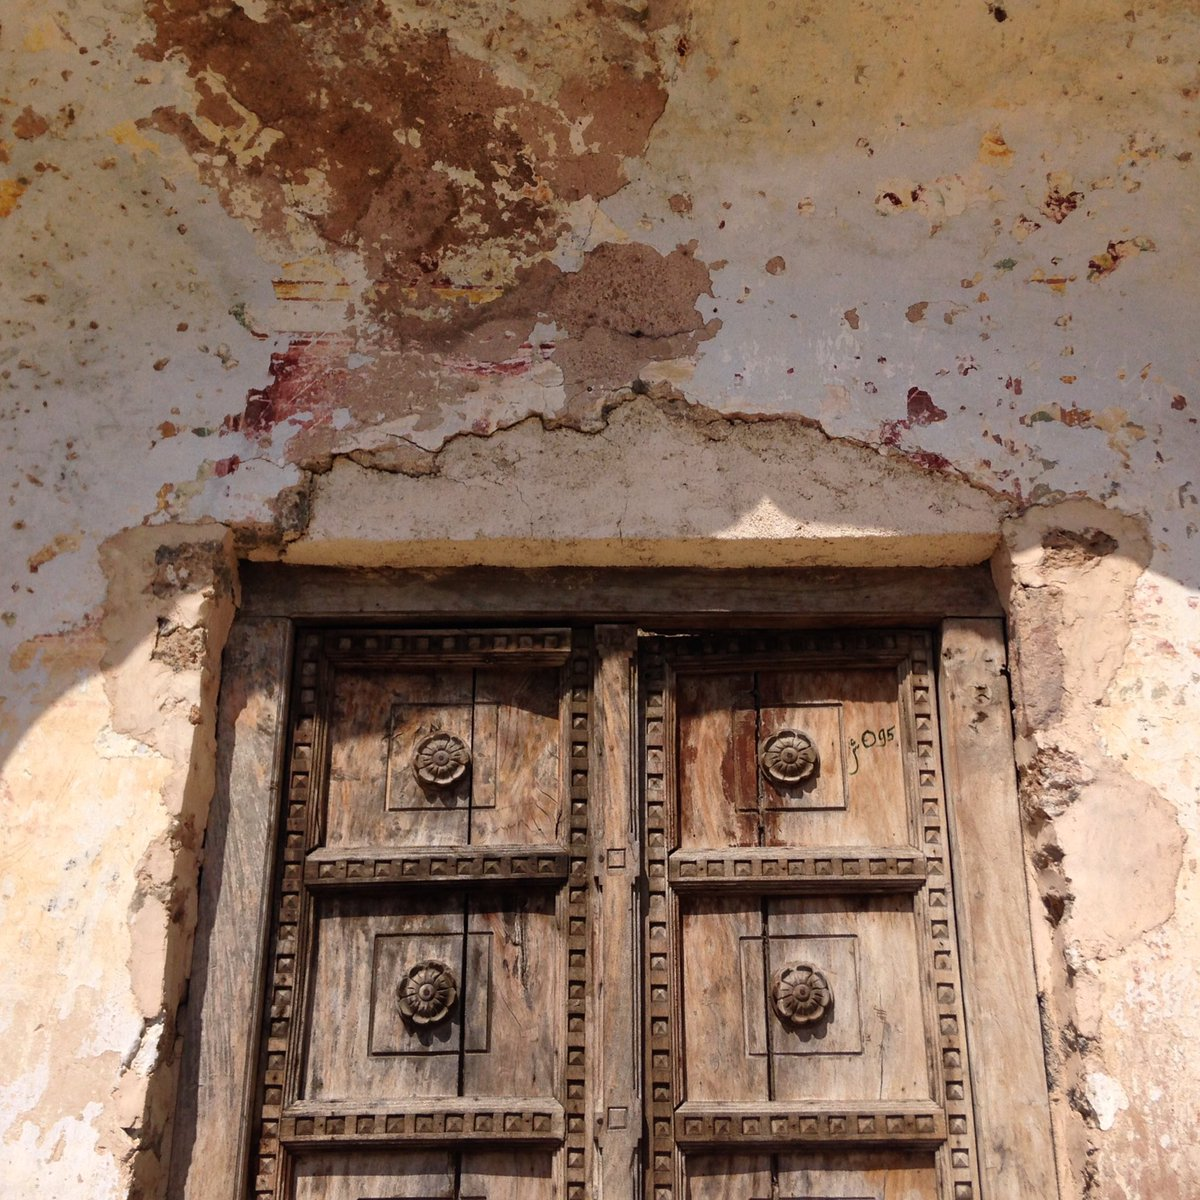 test Twitter Media - Beautiful visit to the Katas Raj temples #Pakistan #Punjab #travel https://t.co/xusZ8GE8xT